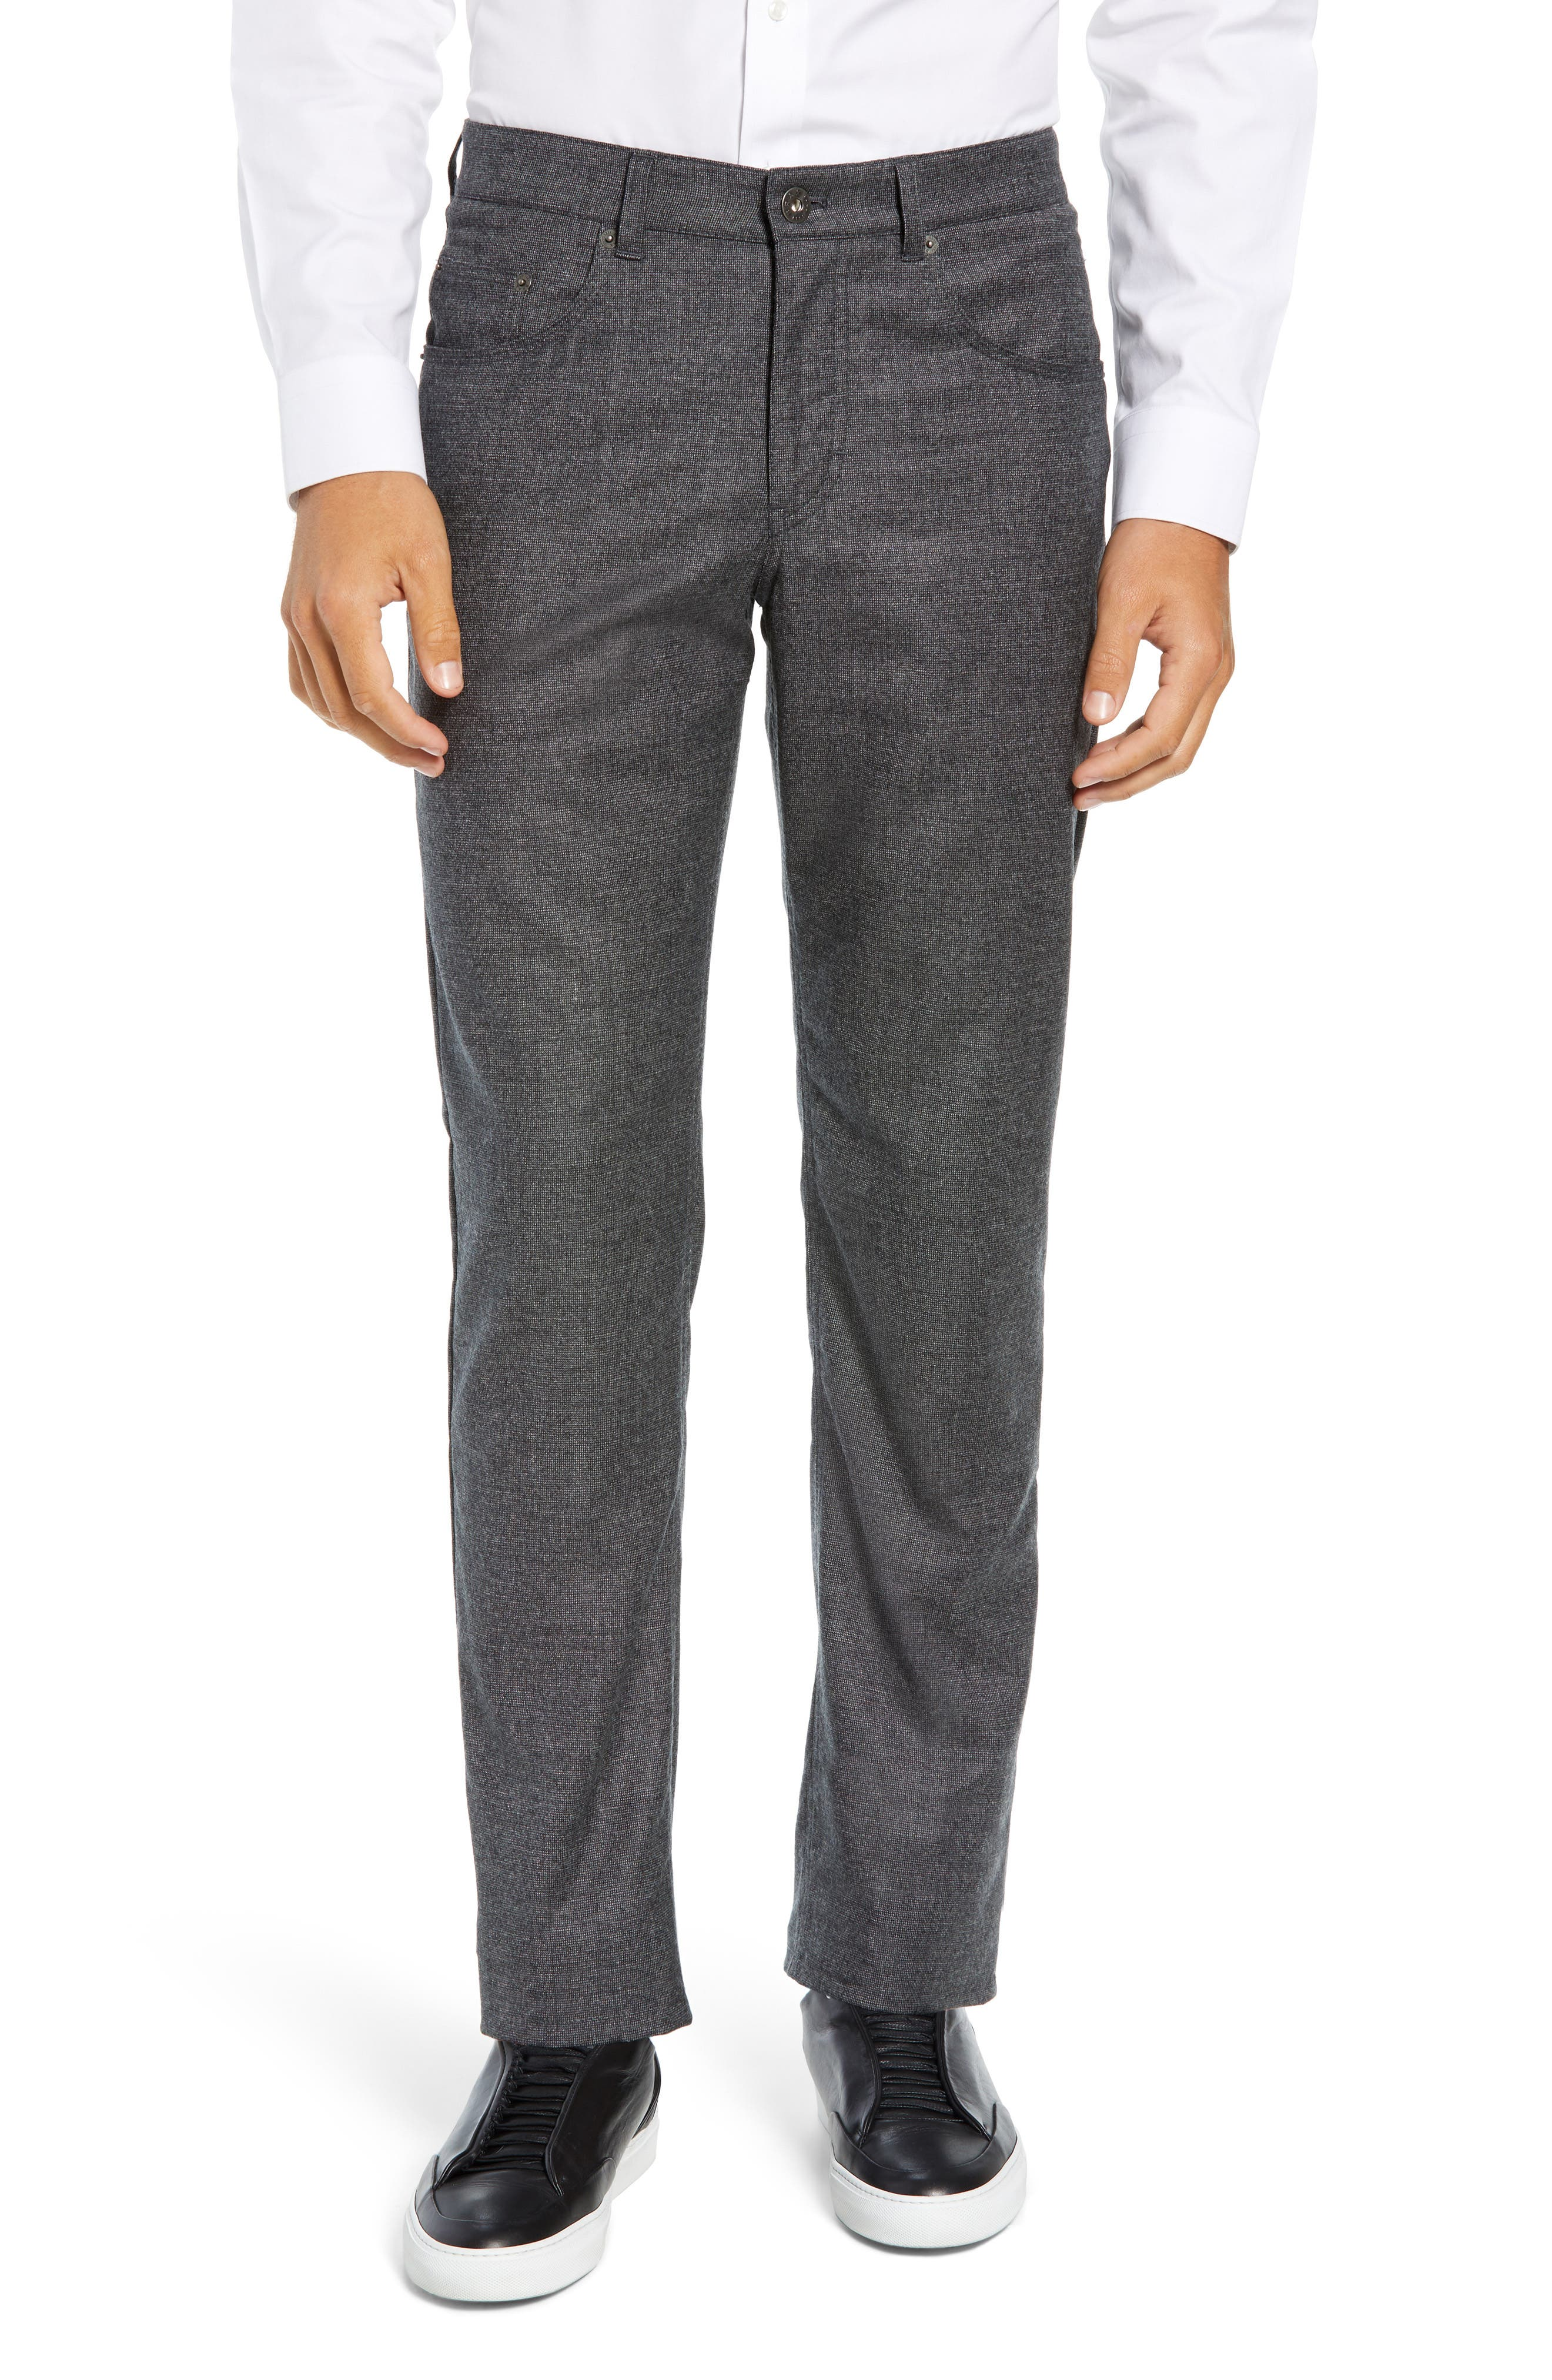 Cadiz Five Pocket Stretch Wool Trousers,                             Main thumbnail 1, color,                             GRAPHITE